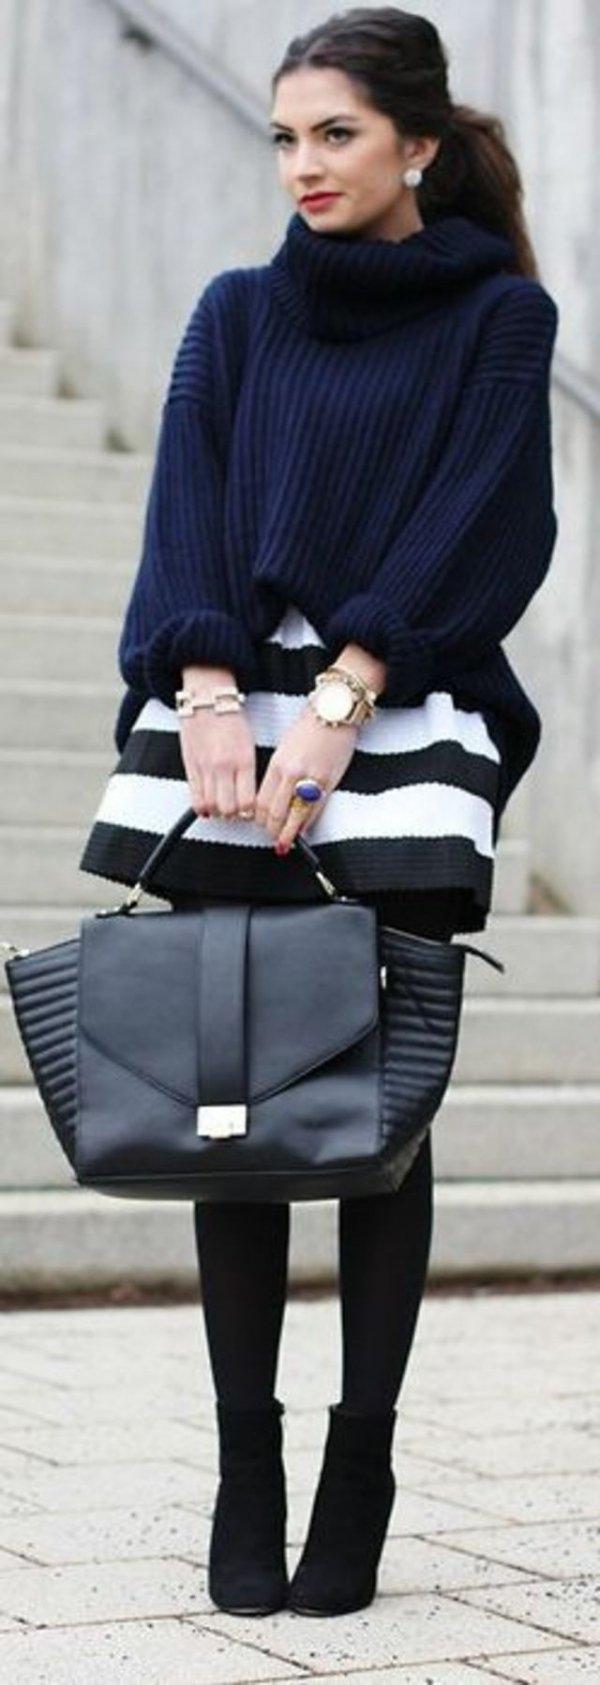 clothing,cap,footwear,outerwear,fashion,